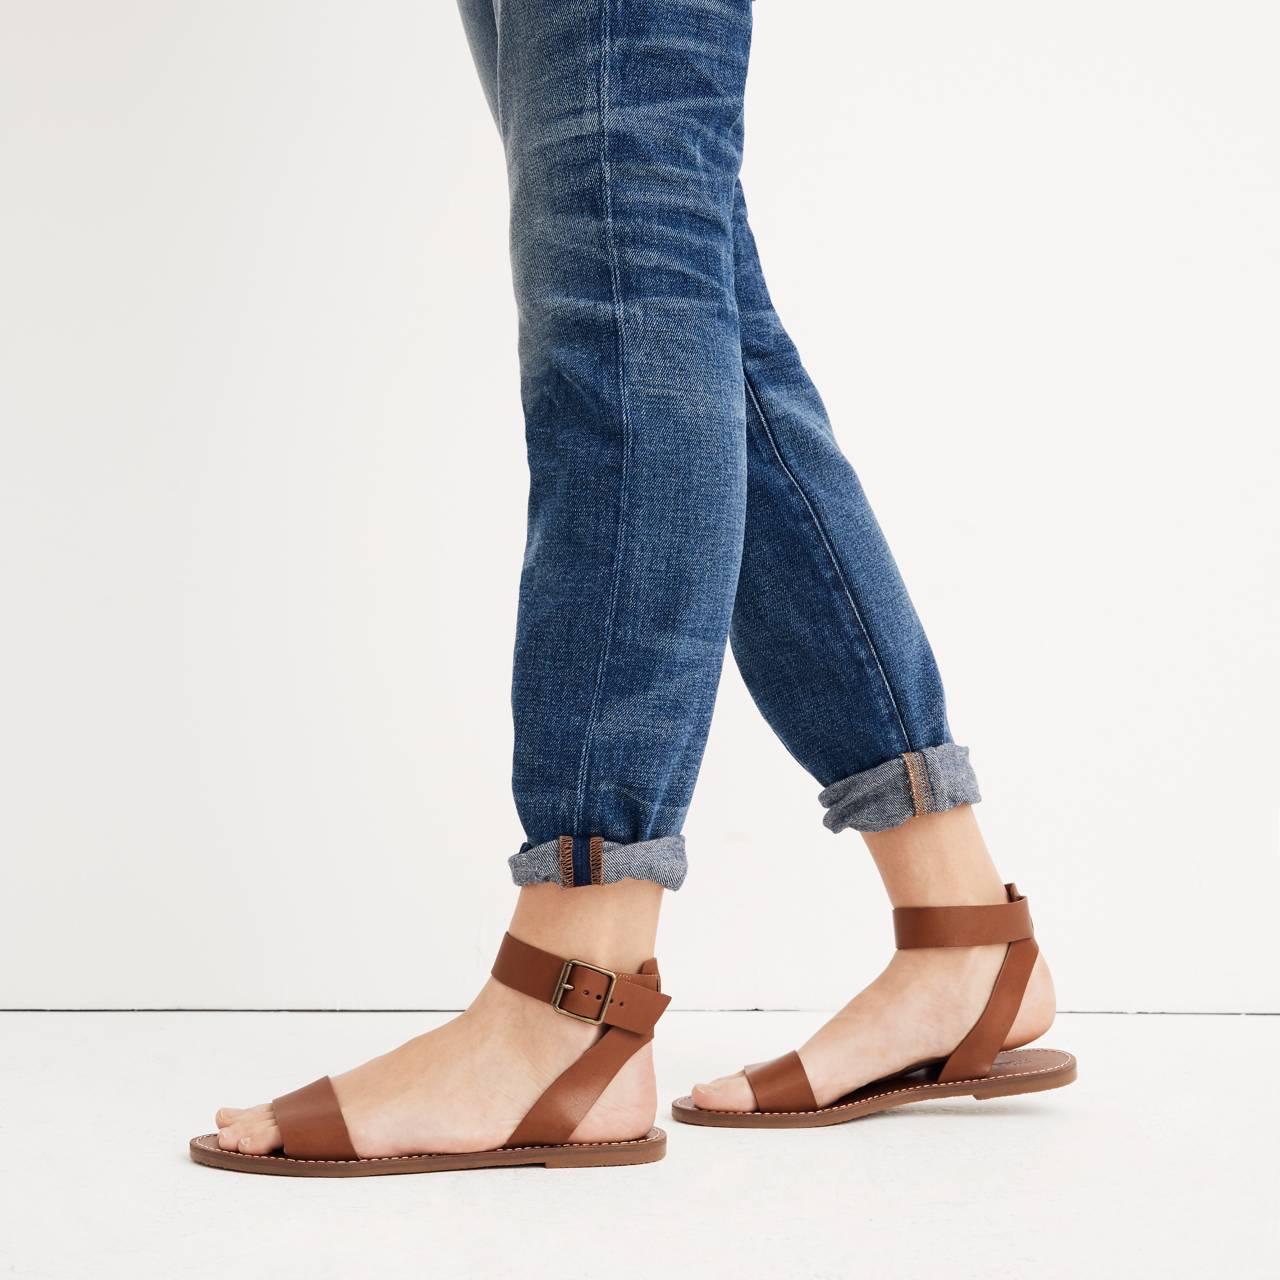 The Boardwalk Ankle-Strap Sandal in english saddle image 2